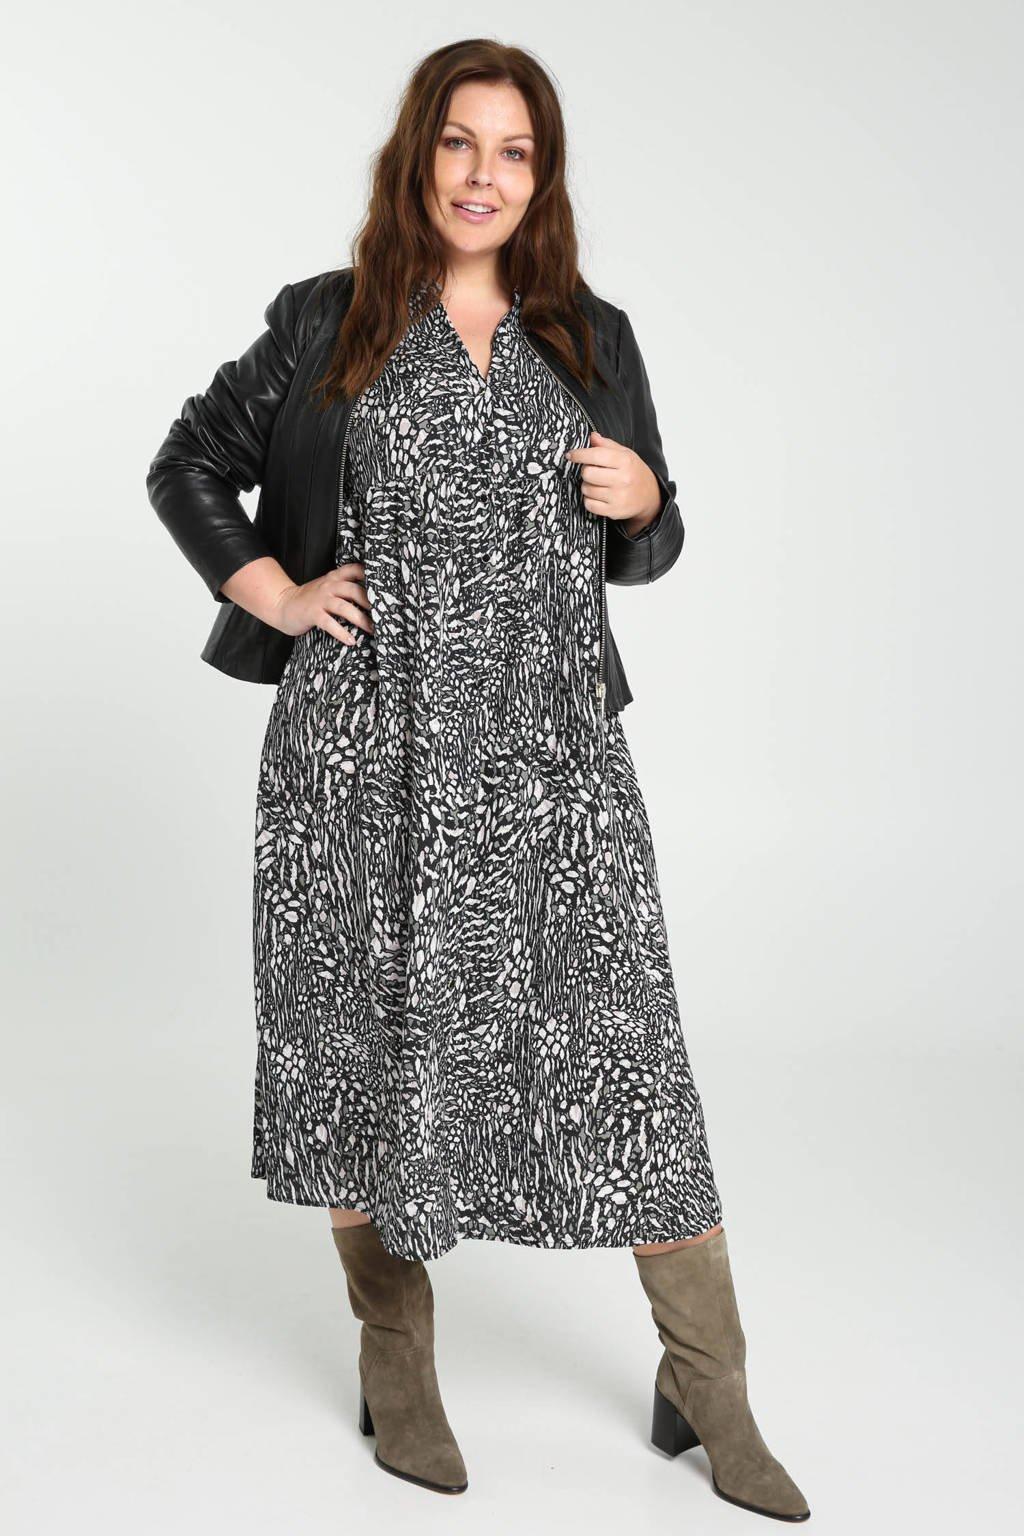 PROMISS jurk met all over print wit/zwart/groen